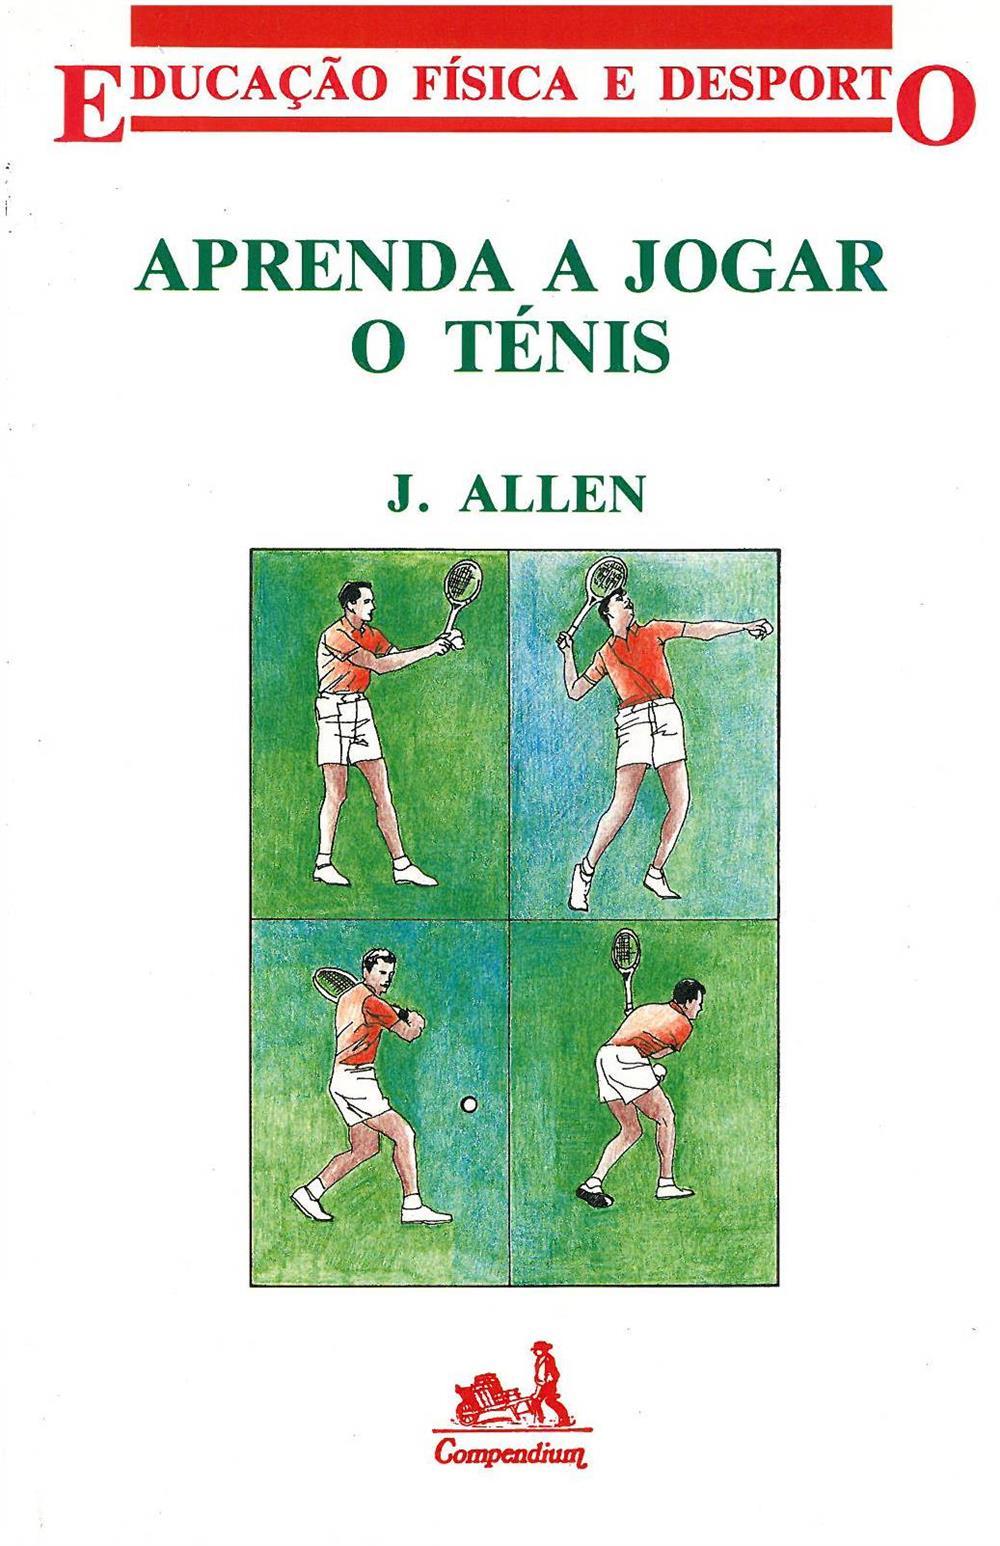 Aprenda a jogar o ténis_.jpg